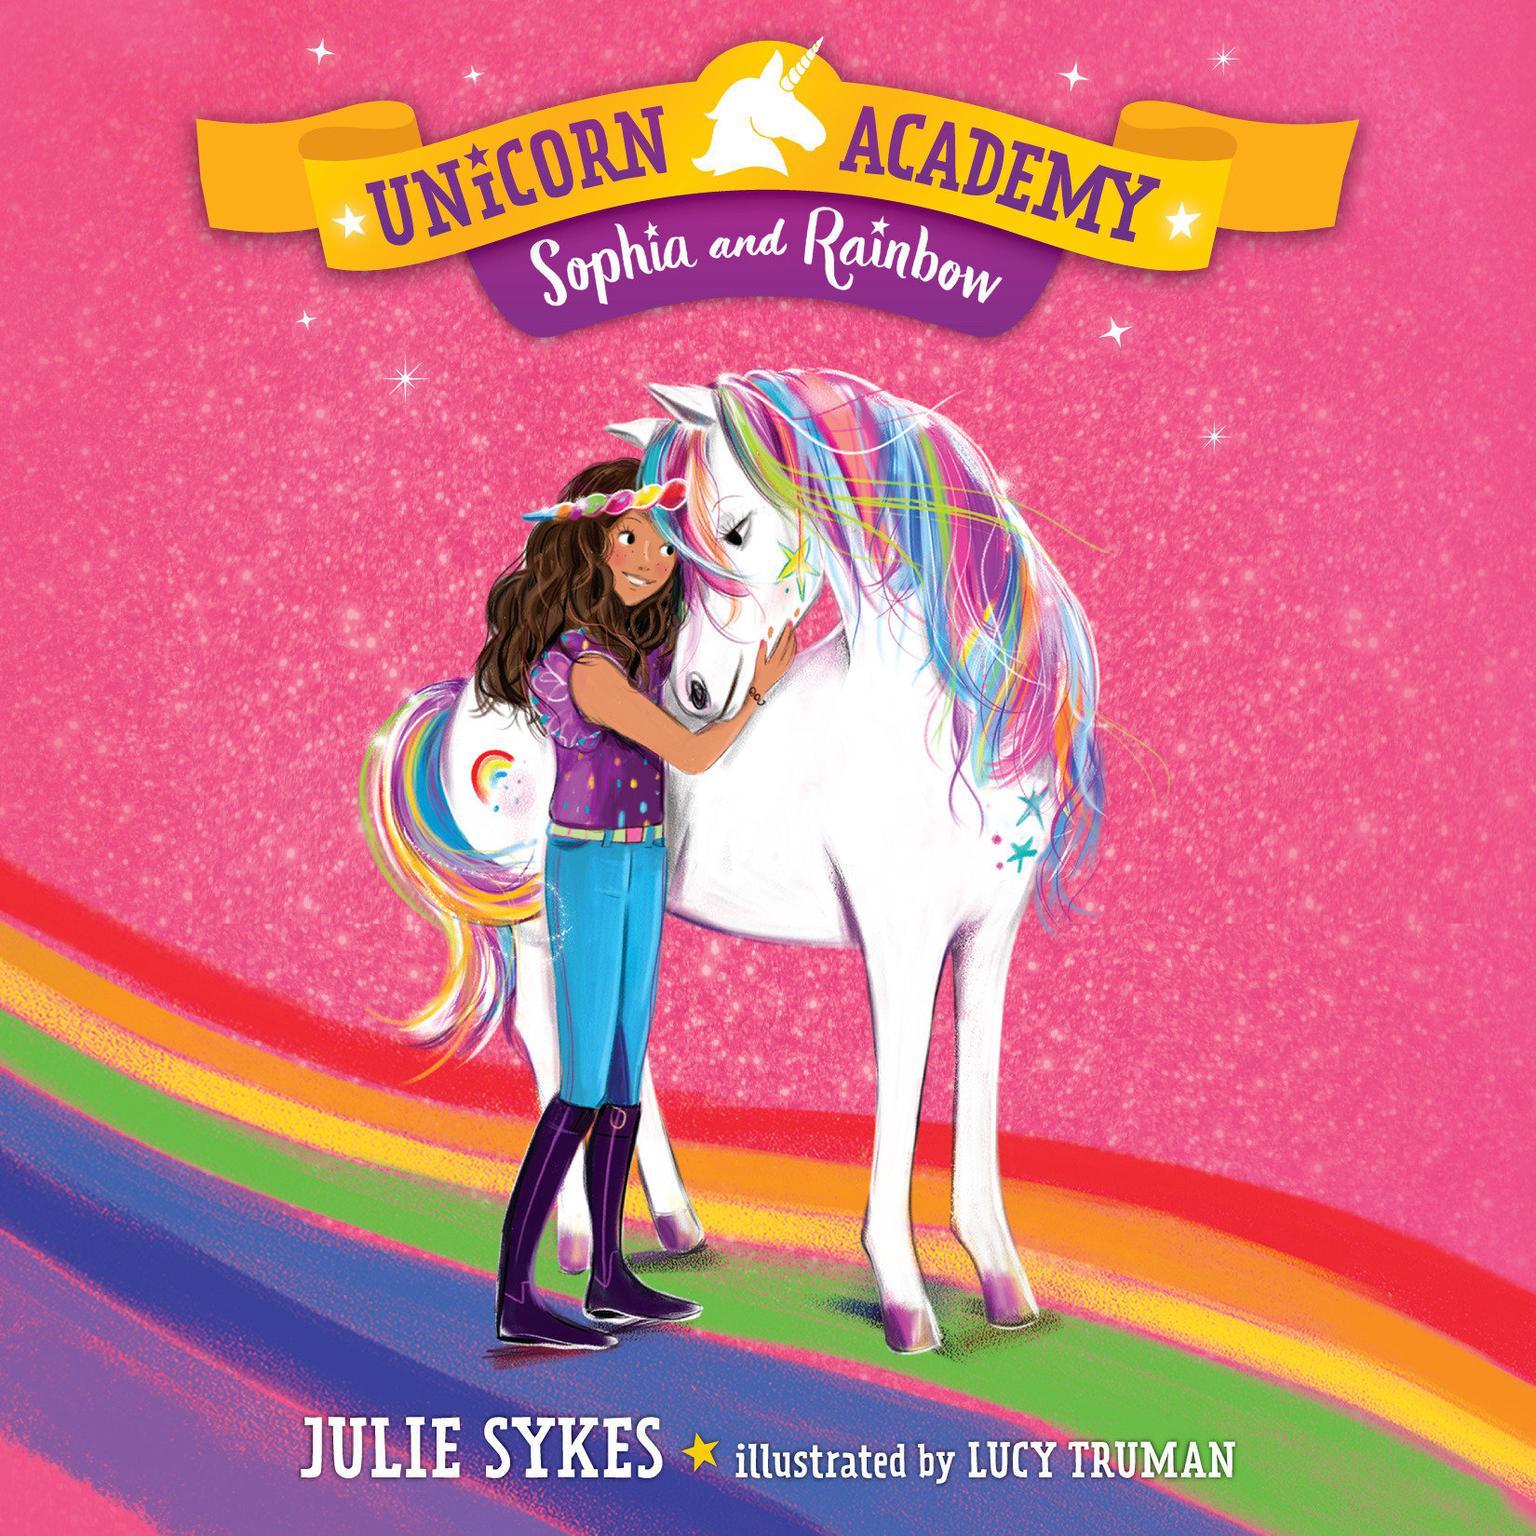 Unicorn Academy #1: Sophia and Rainbow Audiobook, by Julie Sykes